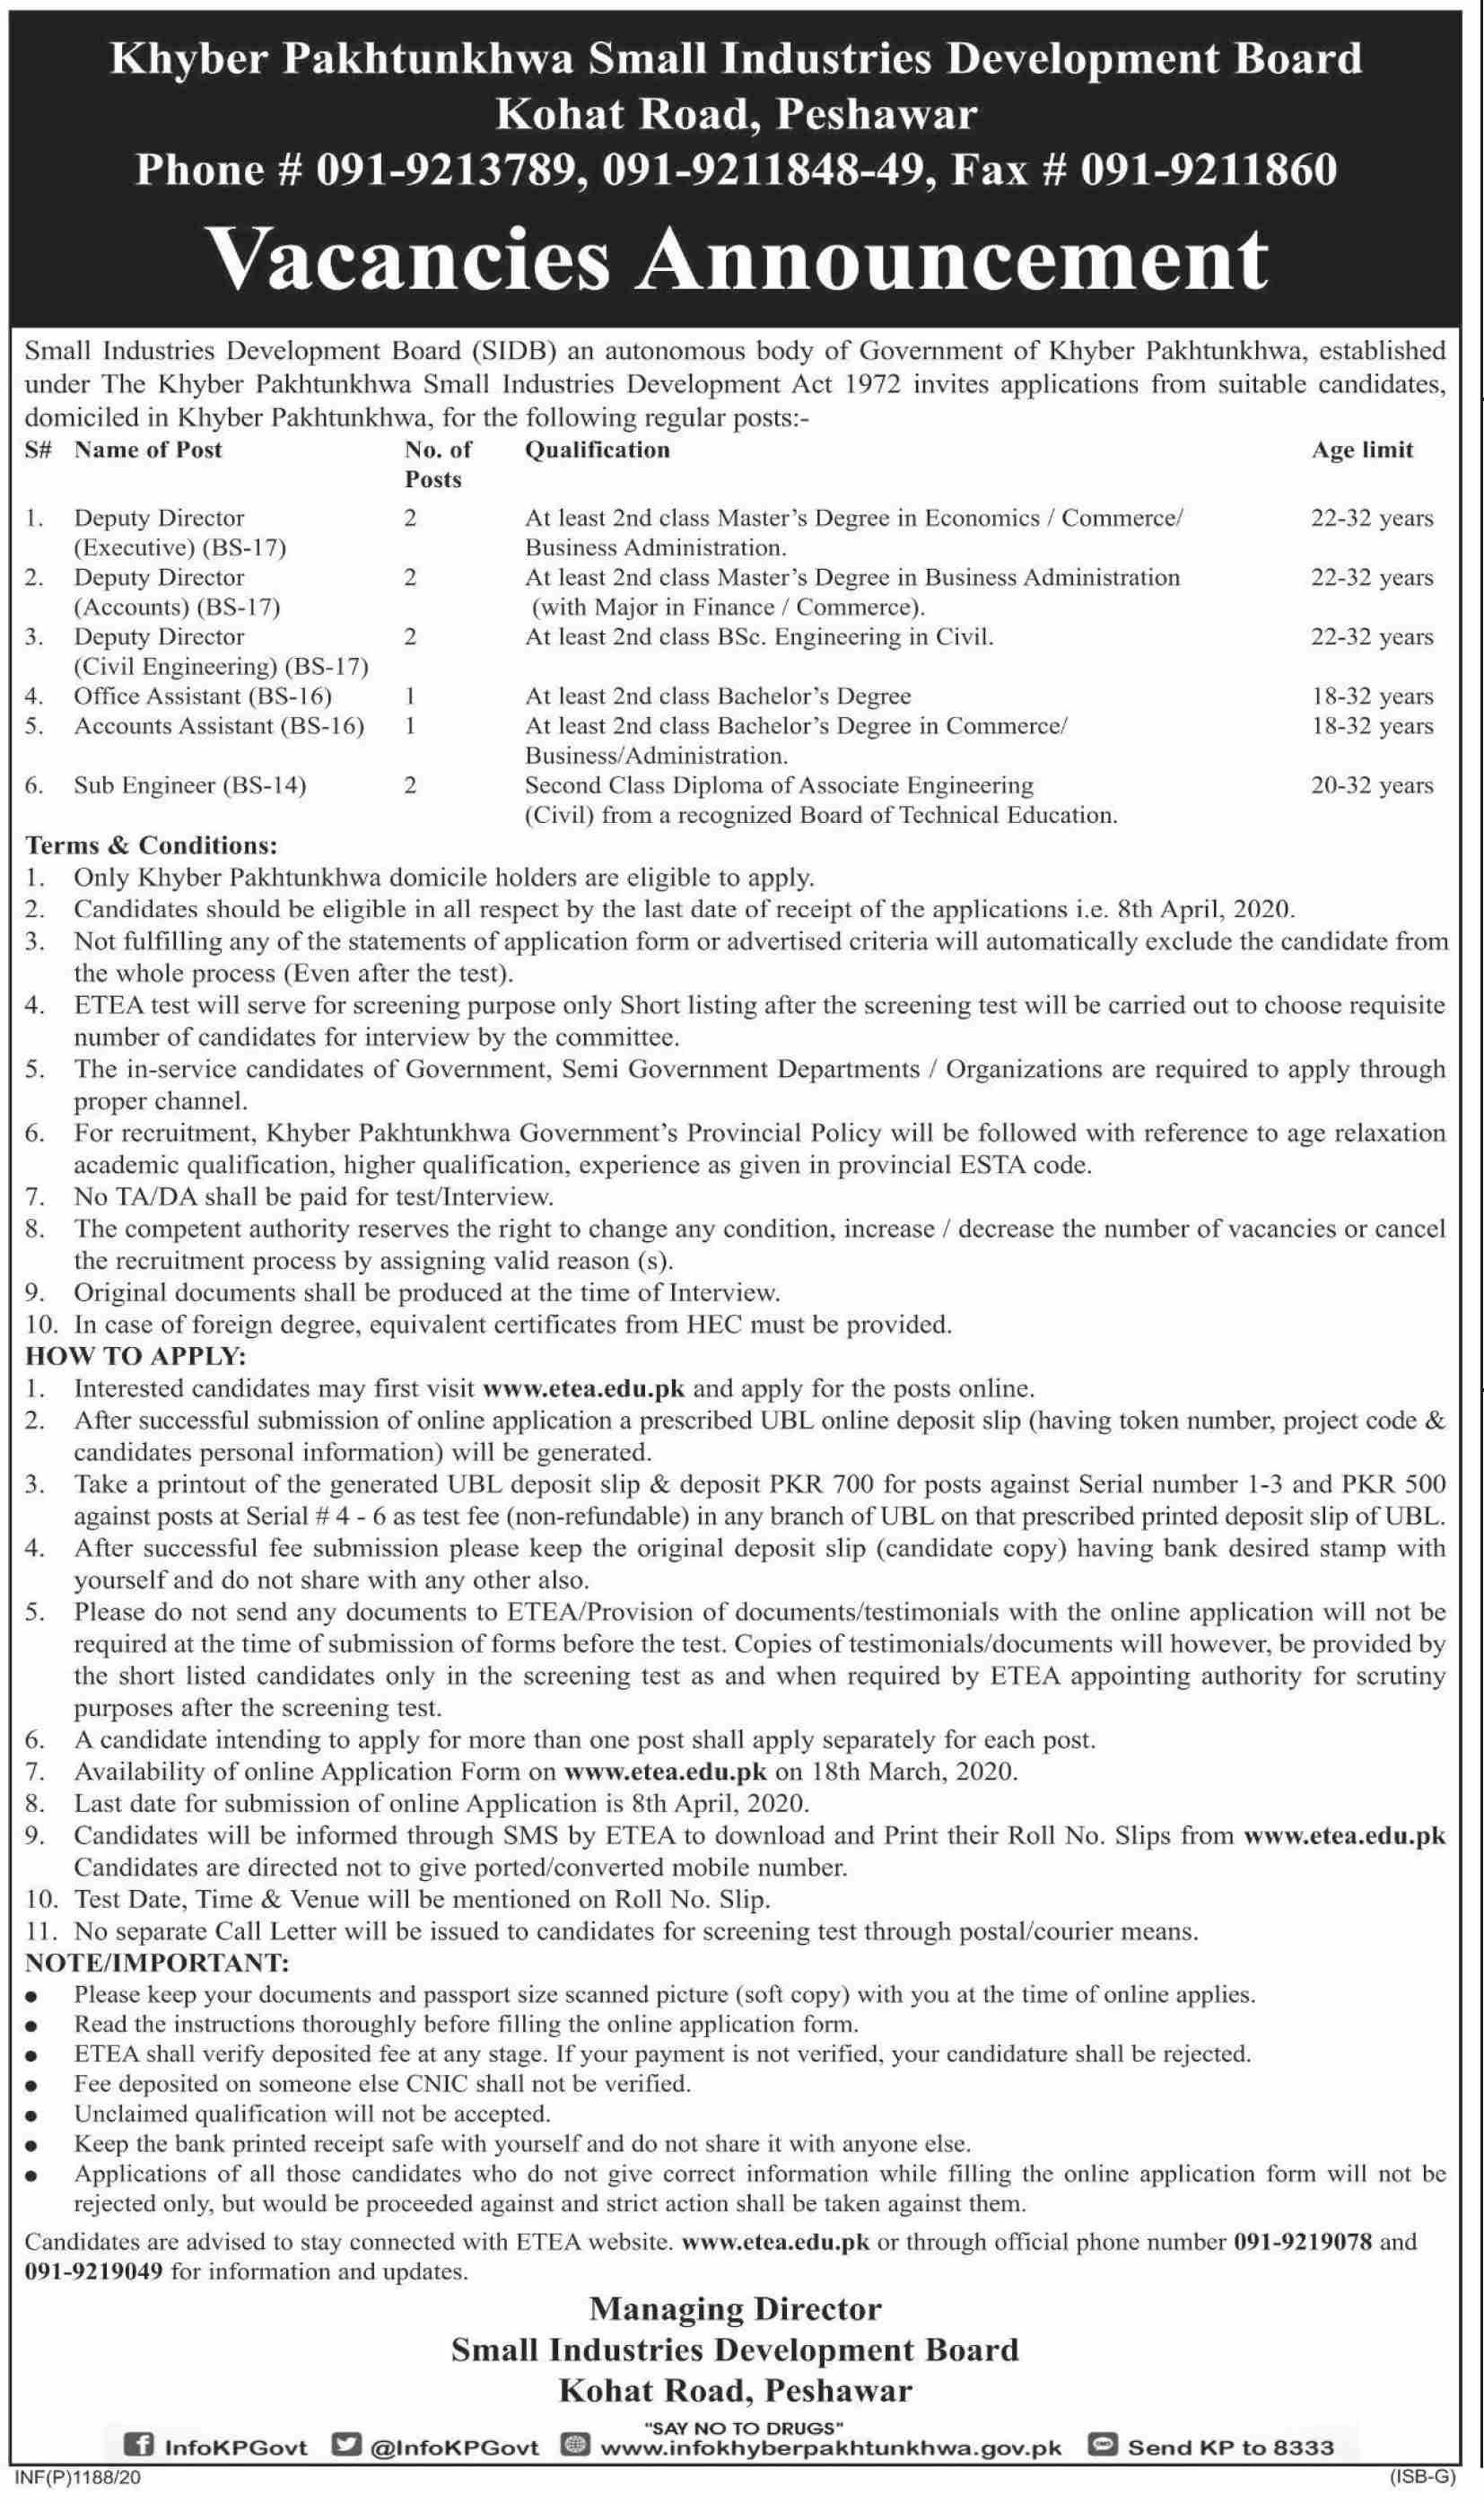 Kpk Small Industries Development Board jobs newspaper ad for Accounts Assistant in Peshawar